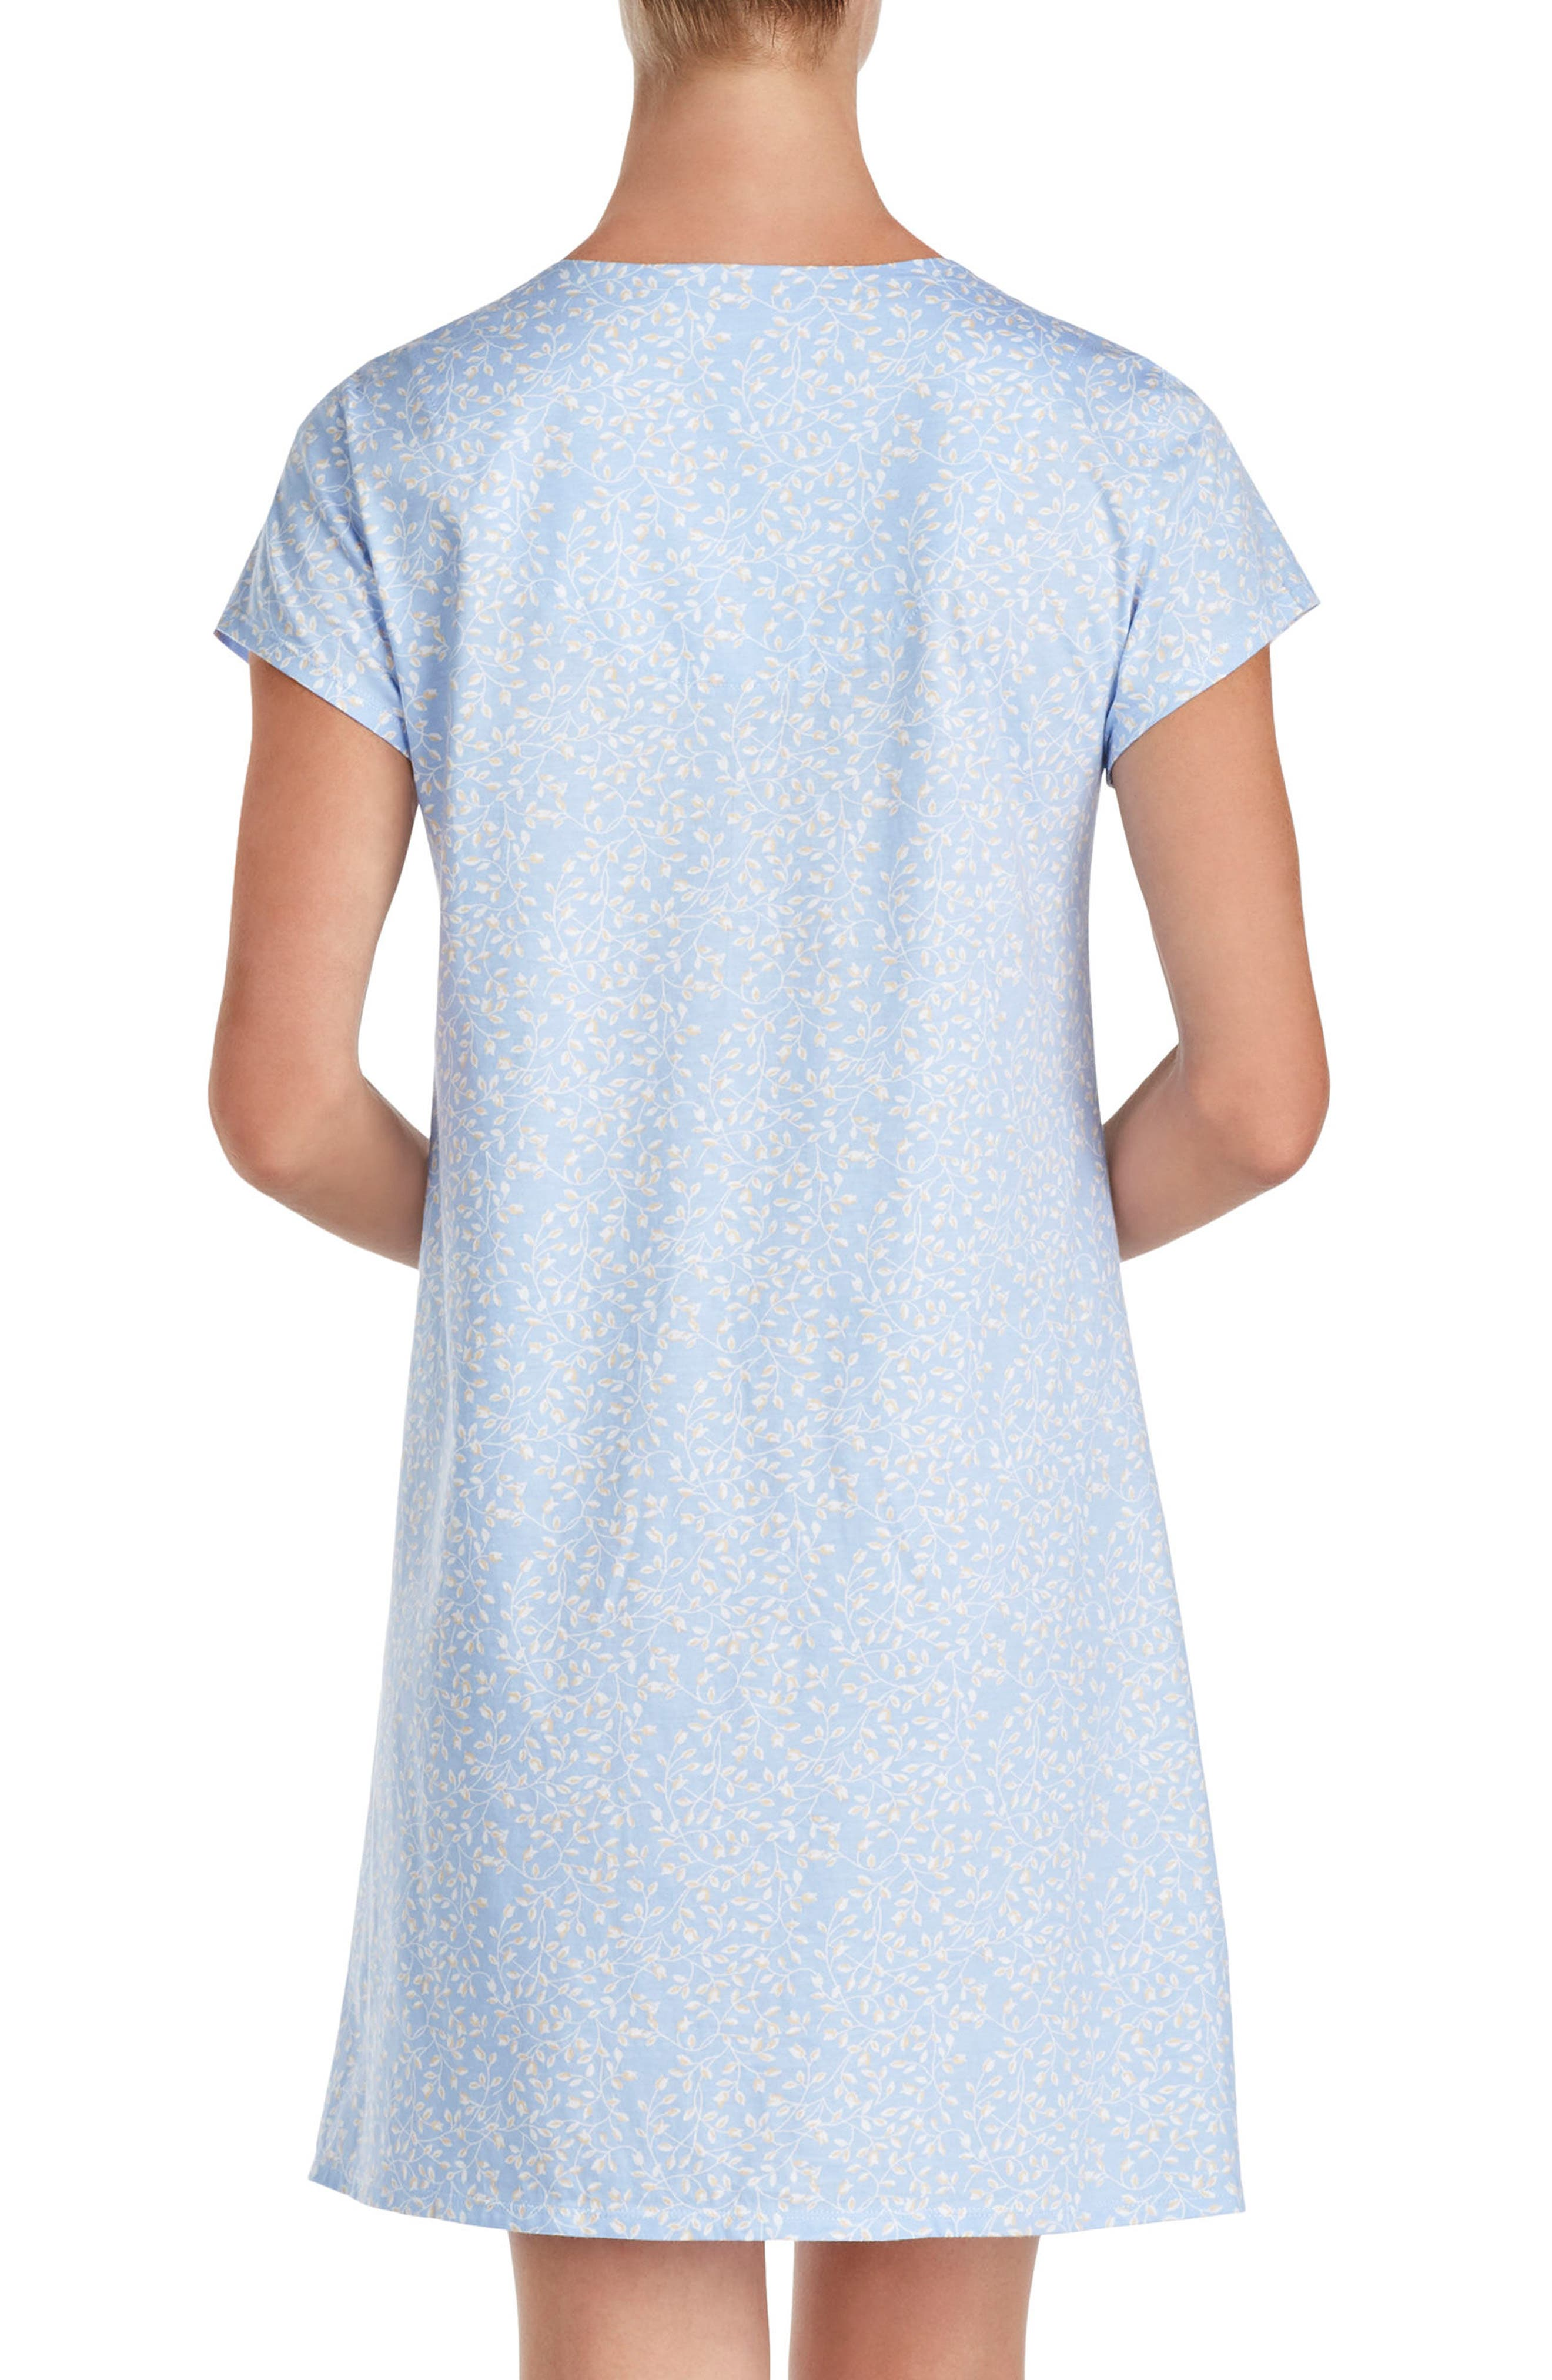 Womens Sleep Shirts Amazon db9a010bc